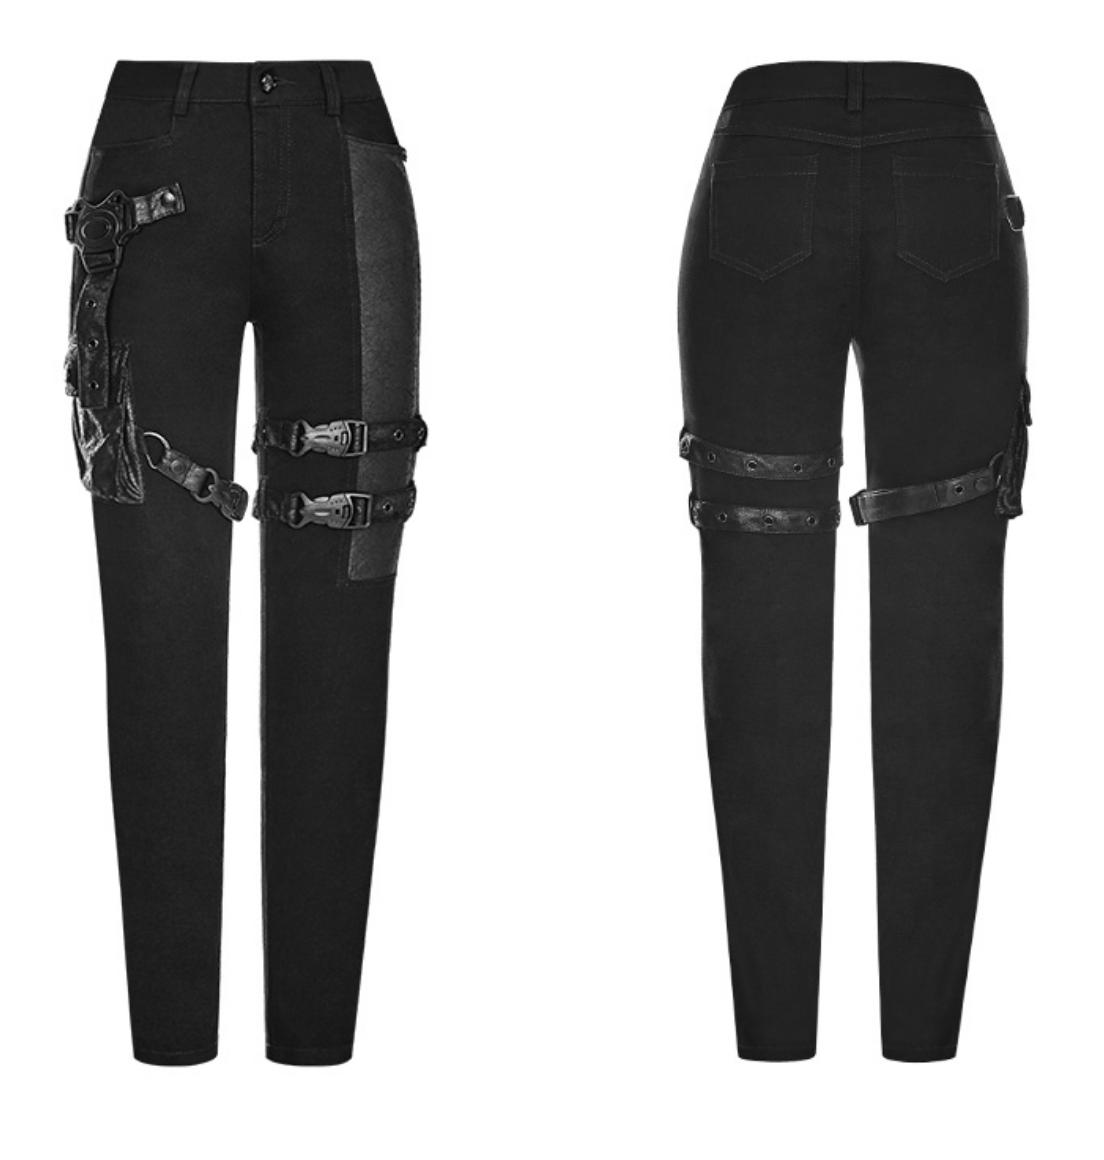 PNKR Black Skinny Pants w/ Leatherette Pouch & Buckles